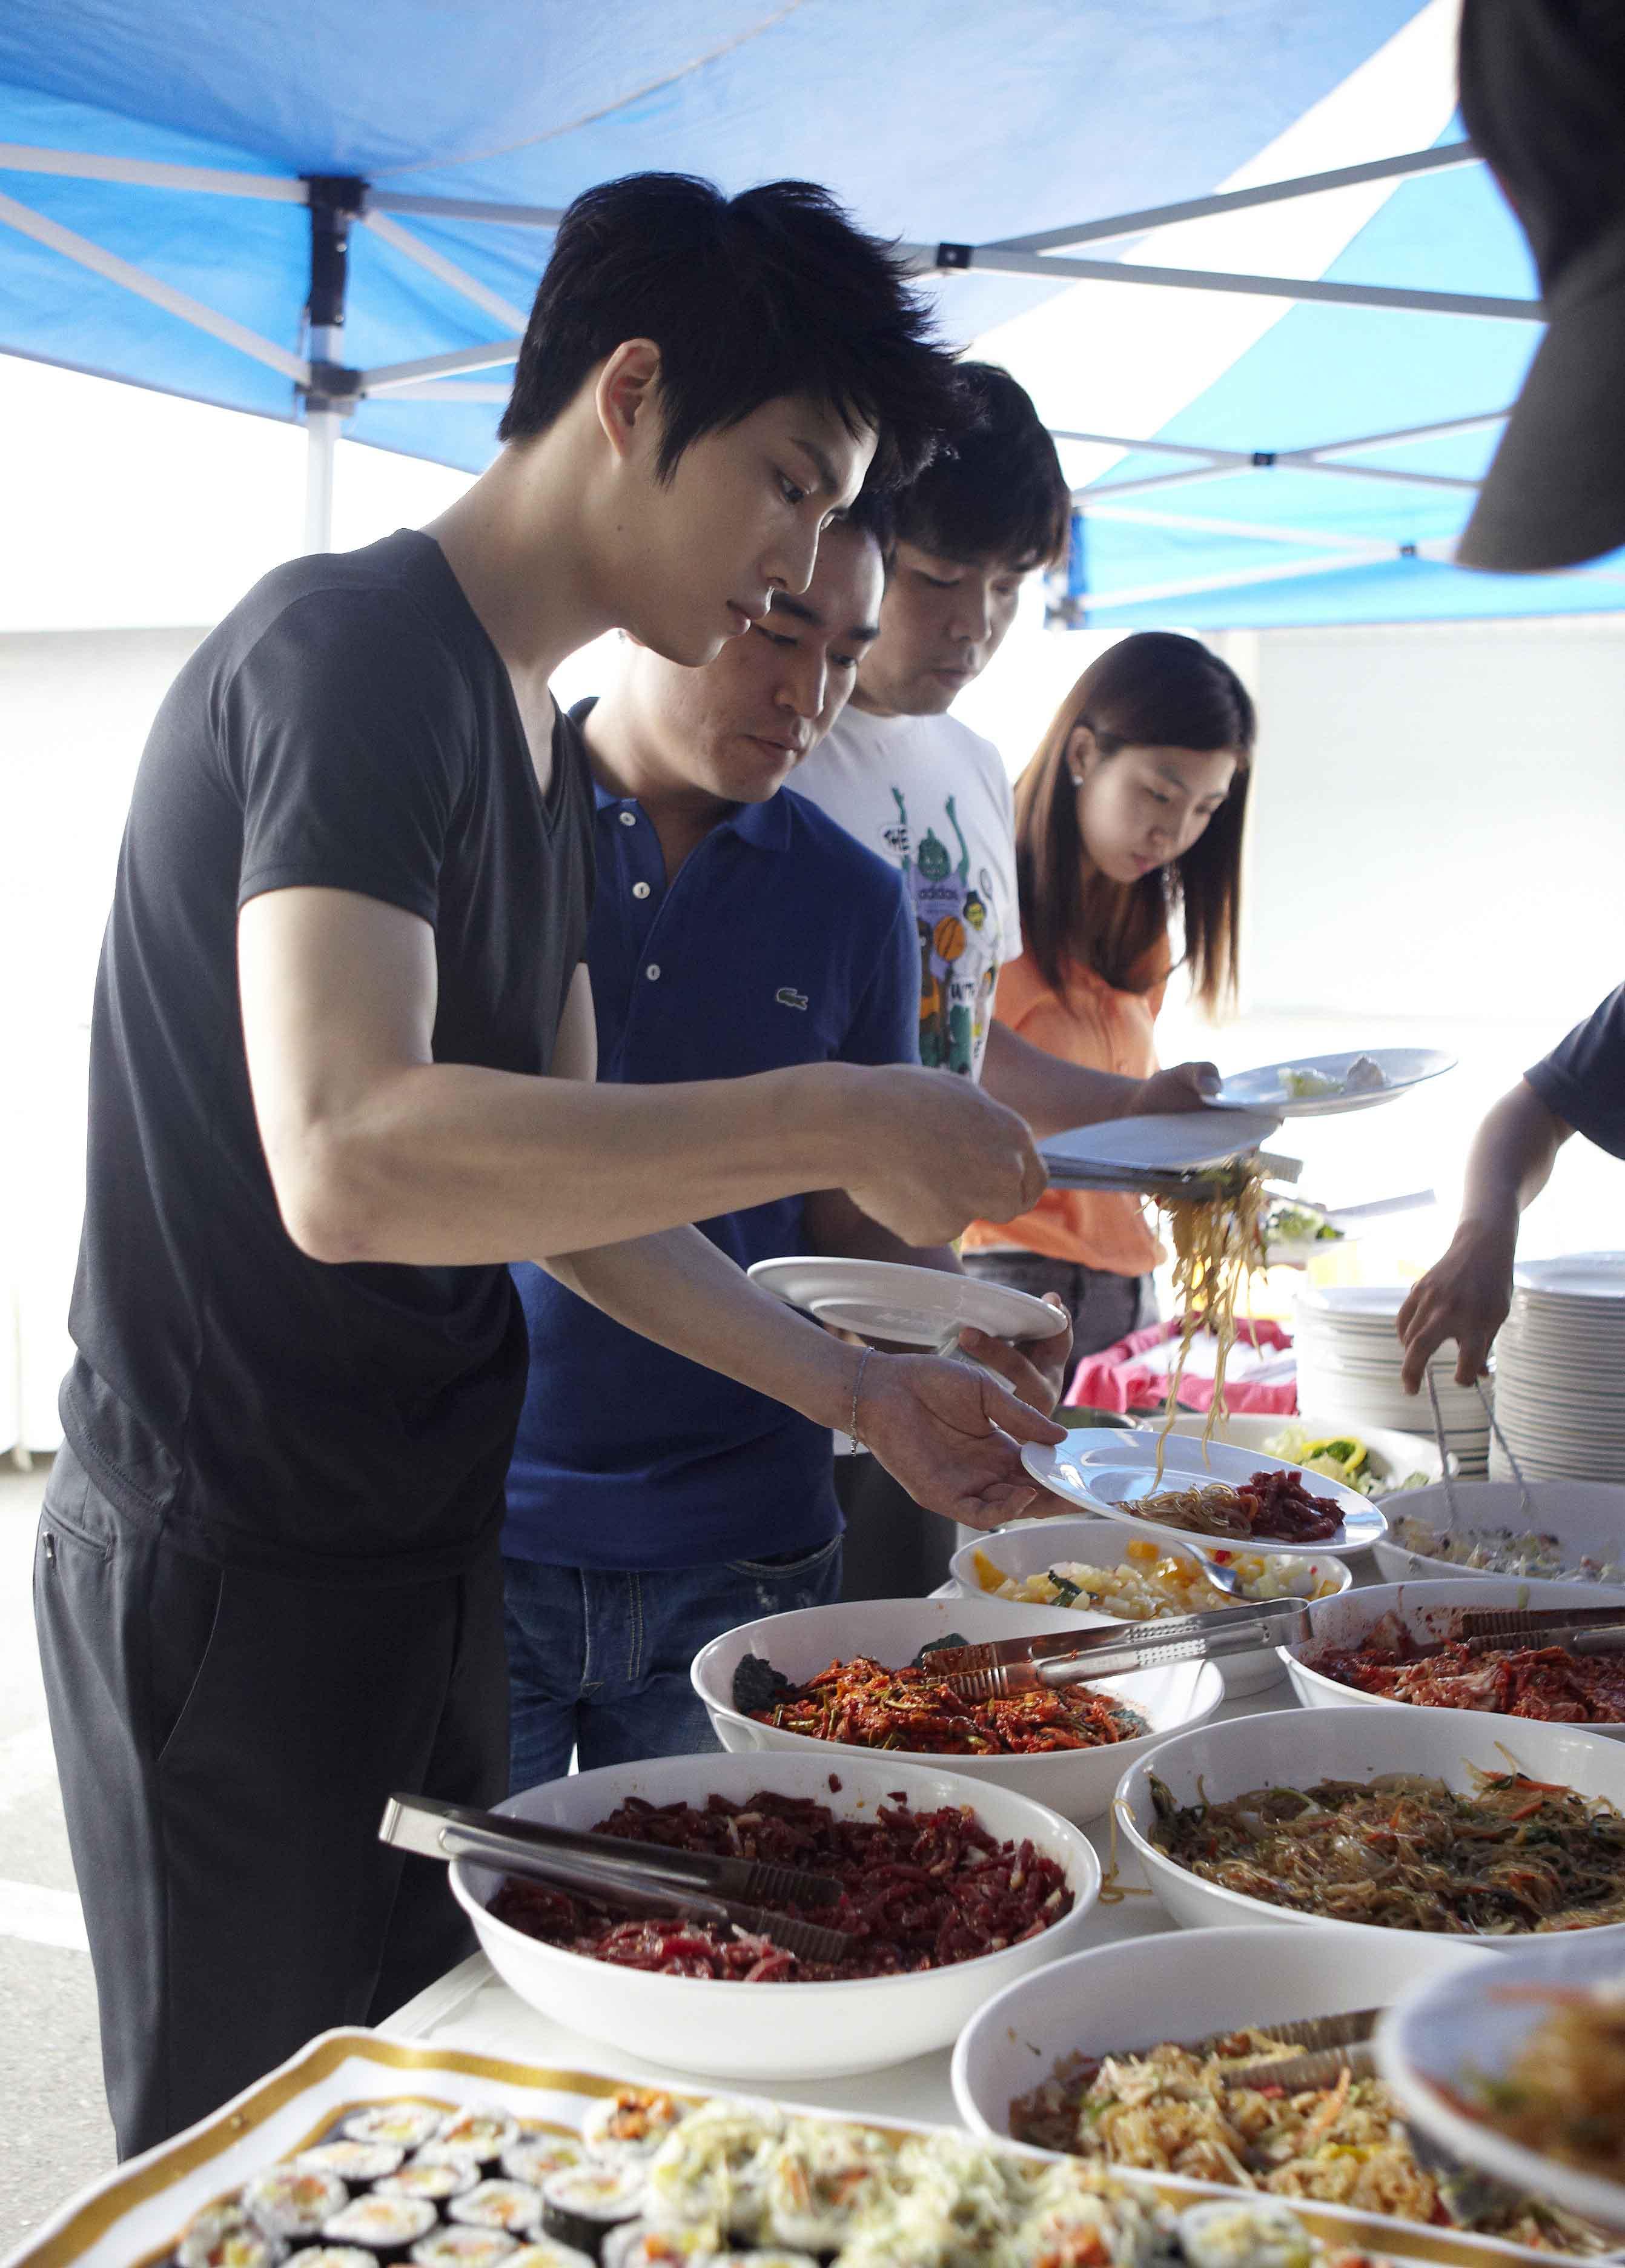 SBS 드라마스페셜 [보스를 지켜라] '김재중 서포터즈, '보스'팀에 100인분 뷔페제공' 썸네일 이미지